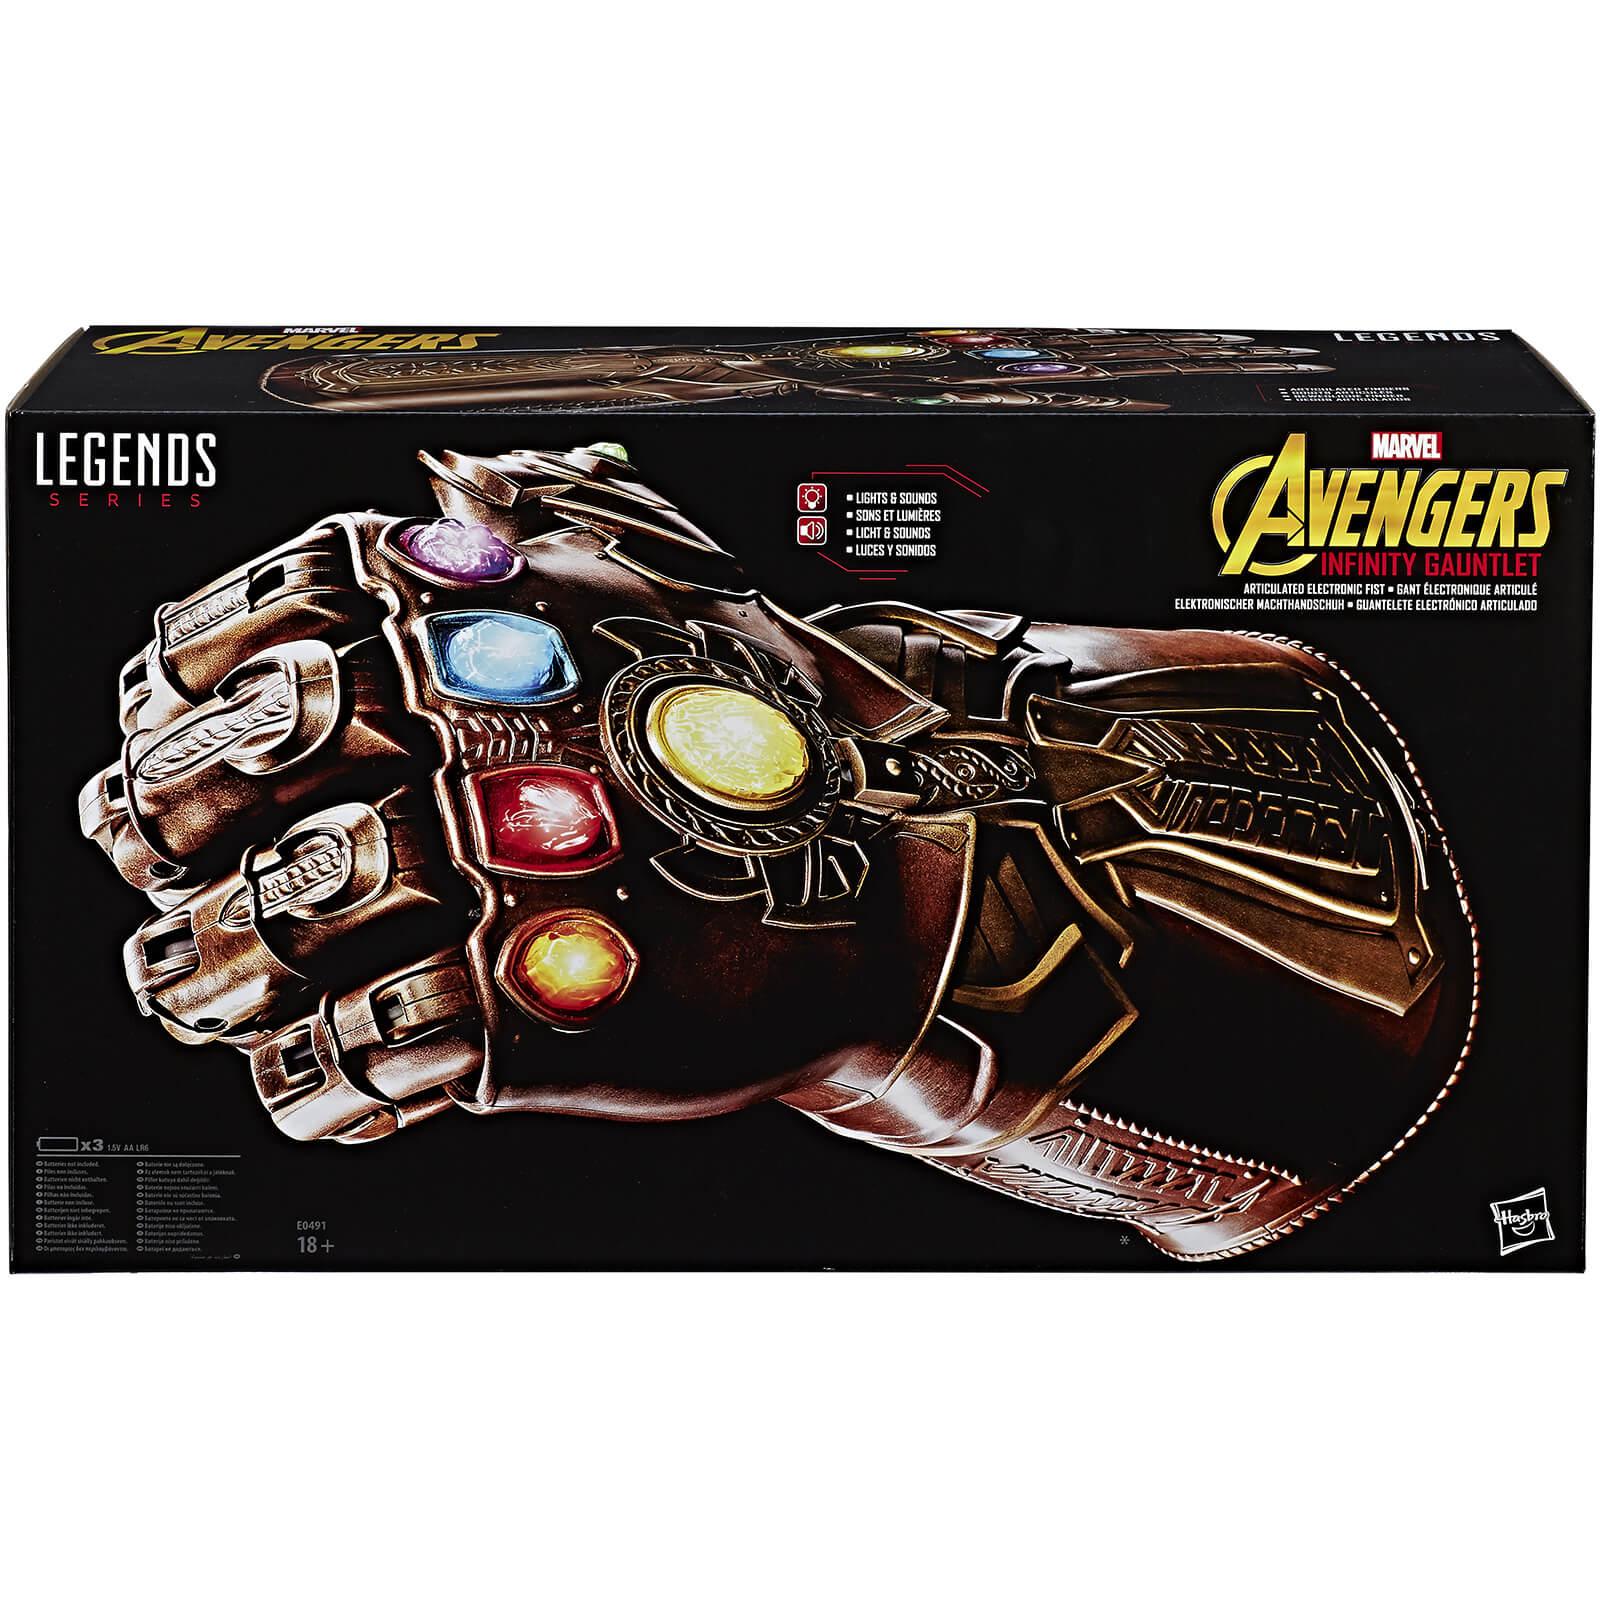 Hasbro Avengers Infinity War Marvel Legends Replica Thanos Infinity Gauntlet £72 at Zavvi